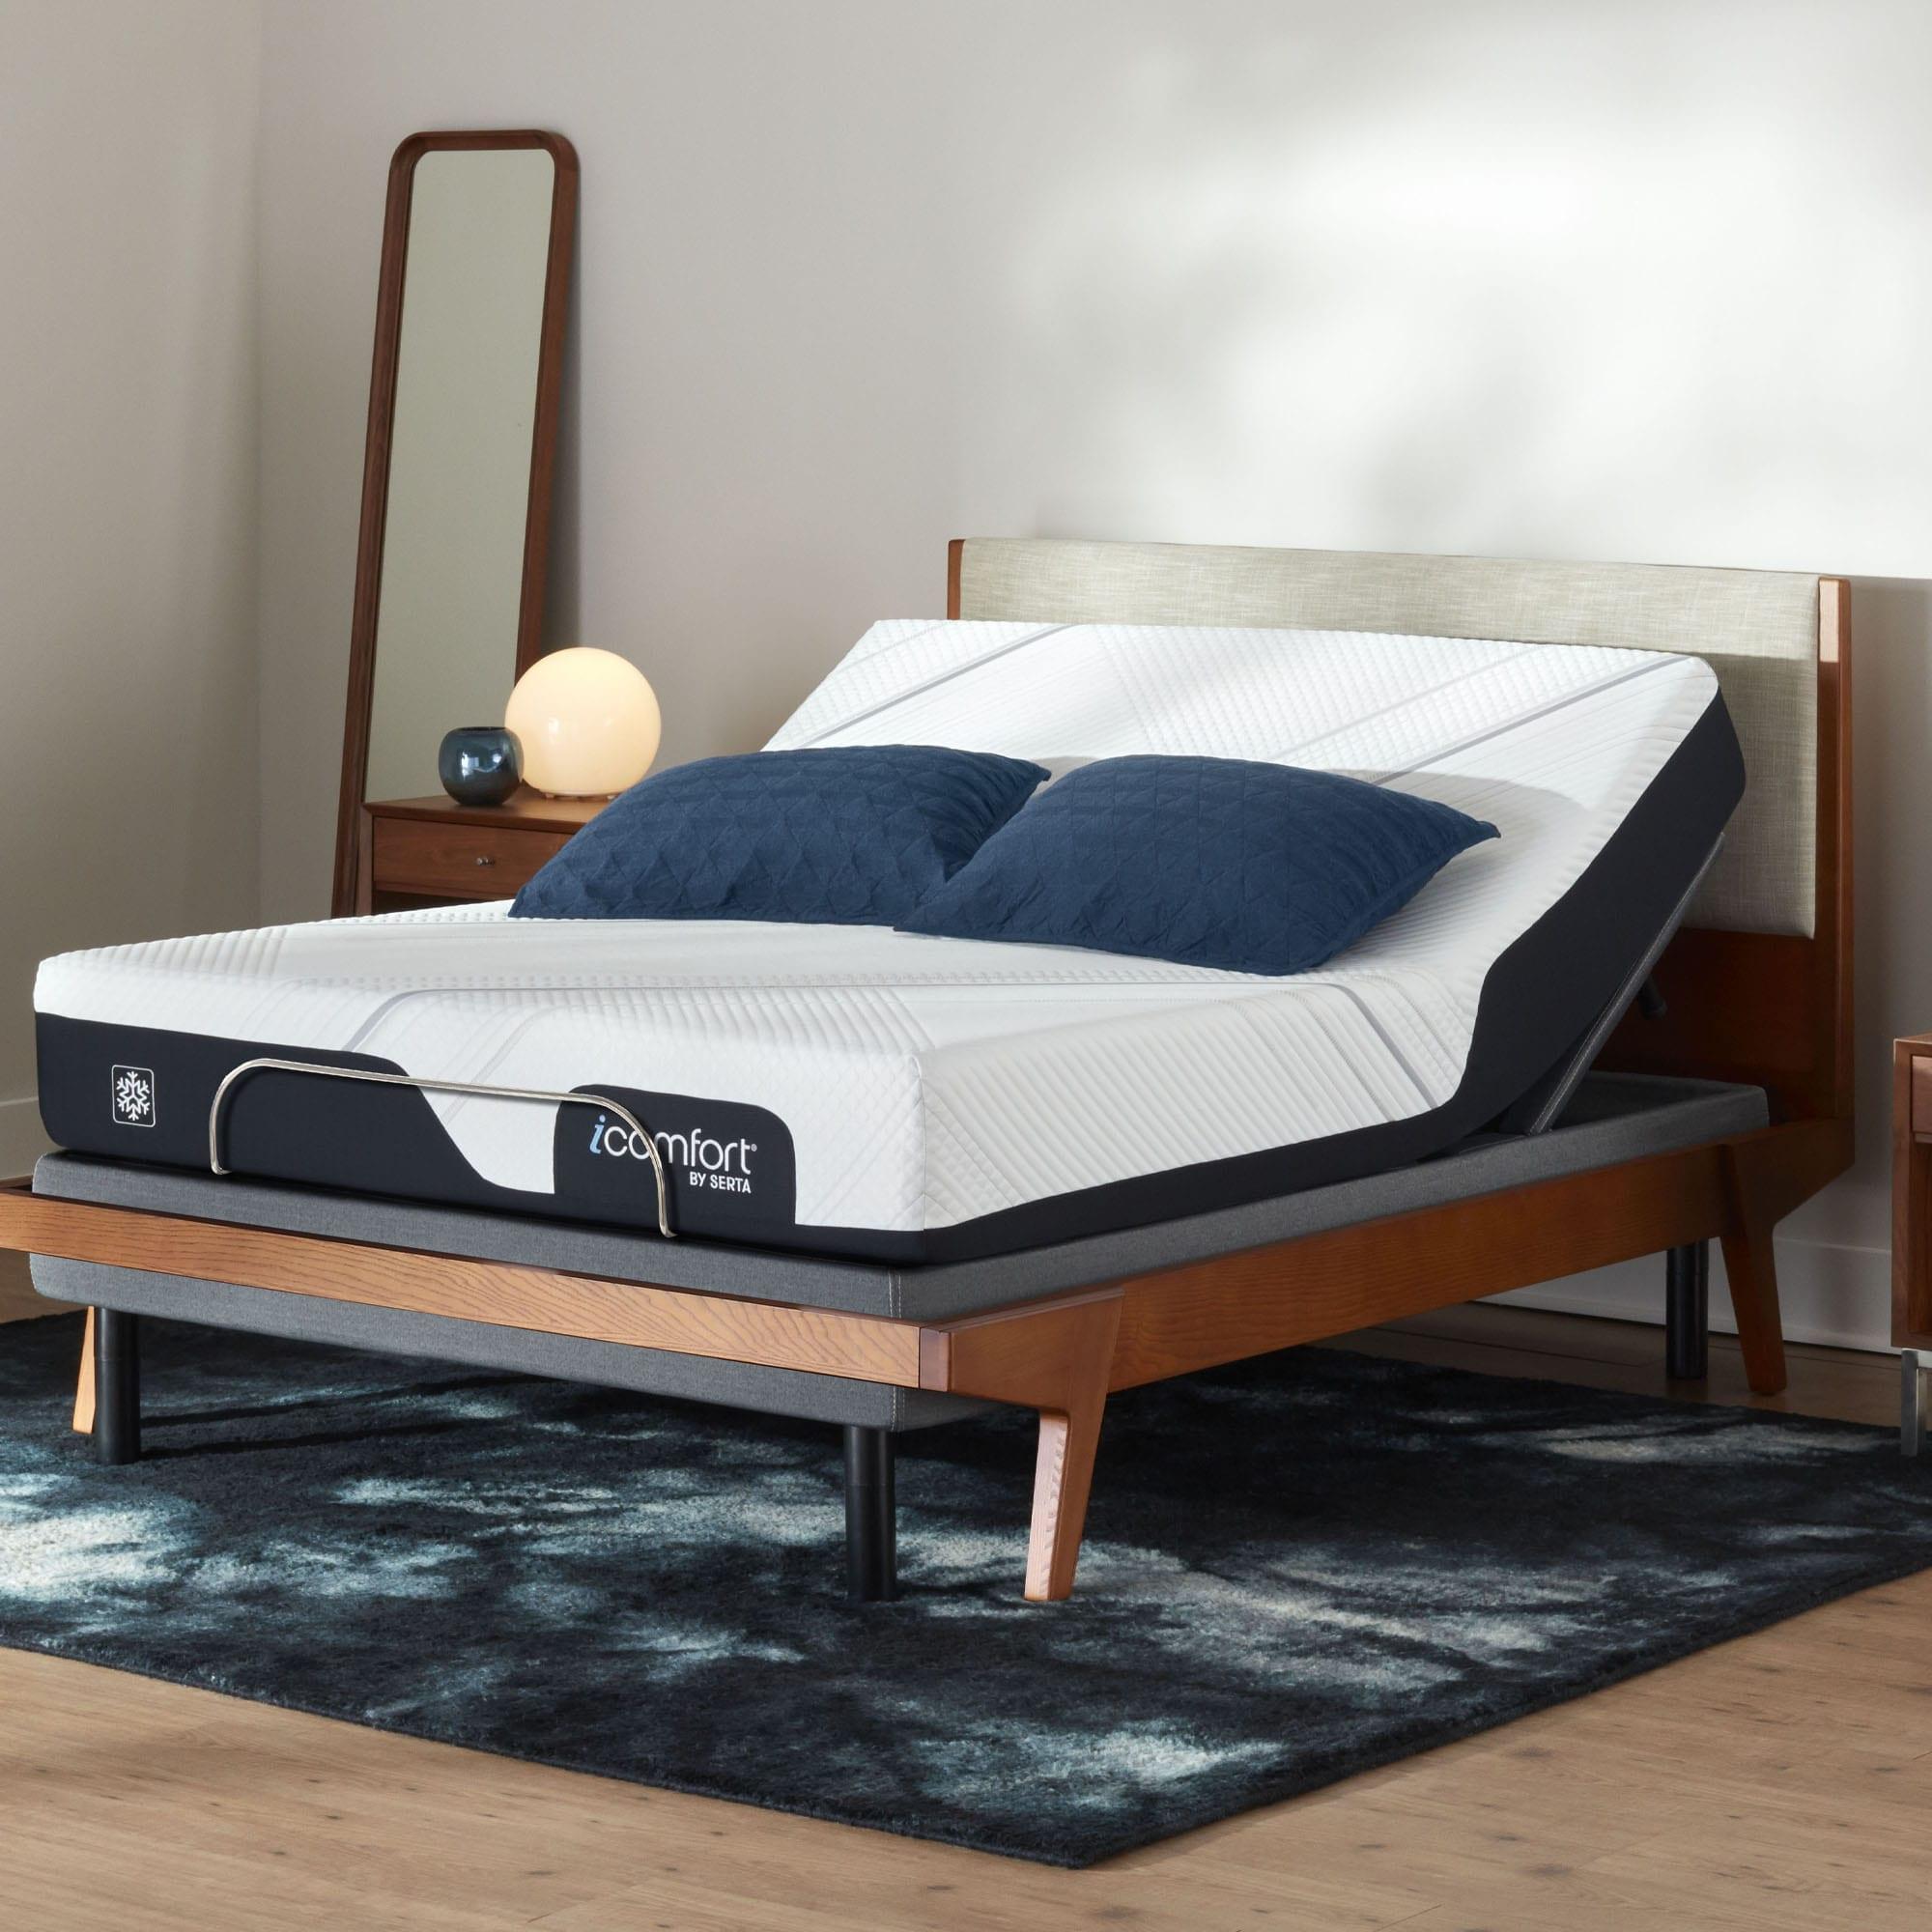 Serta iComfort CF4000 mattress